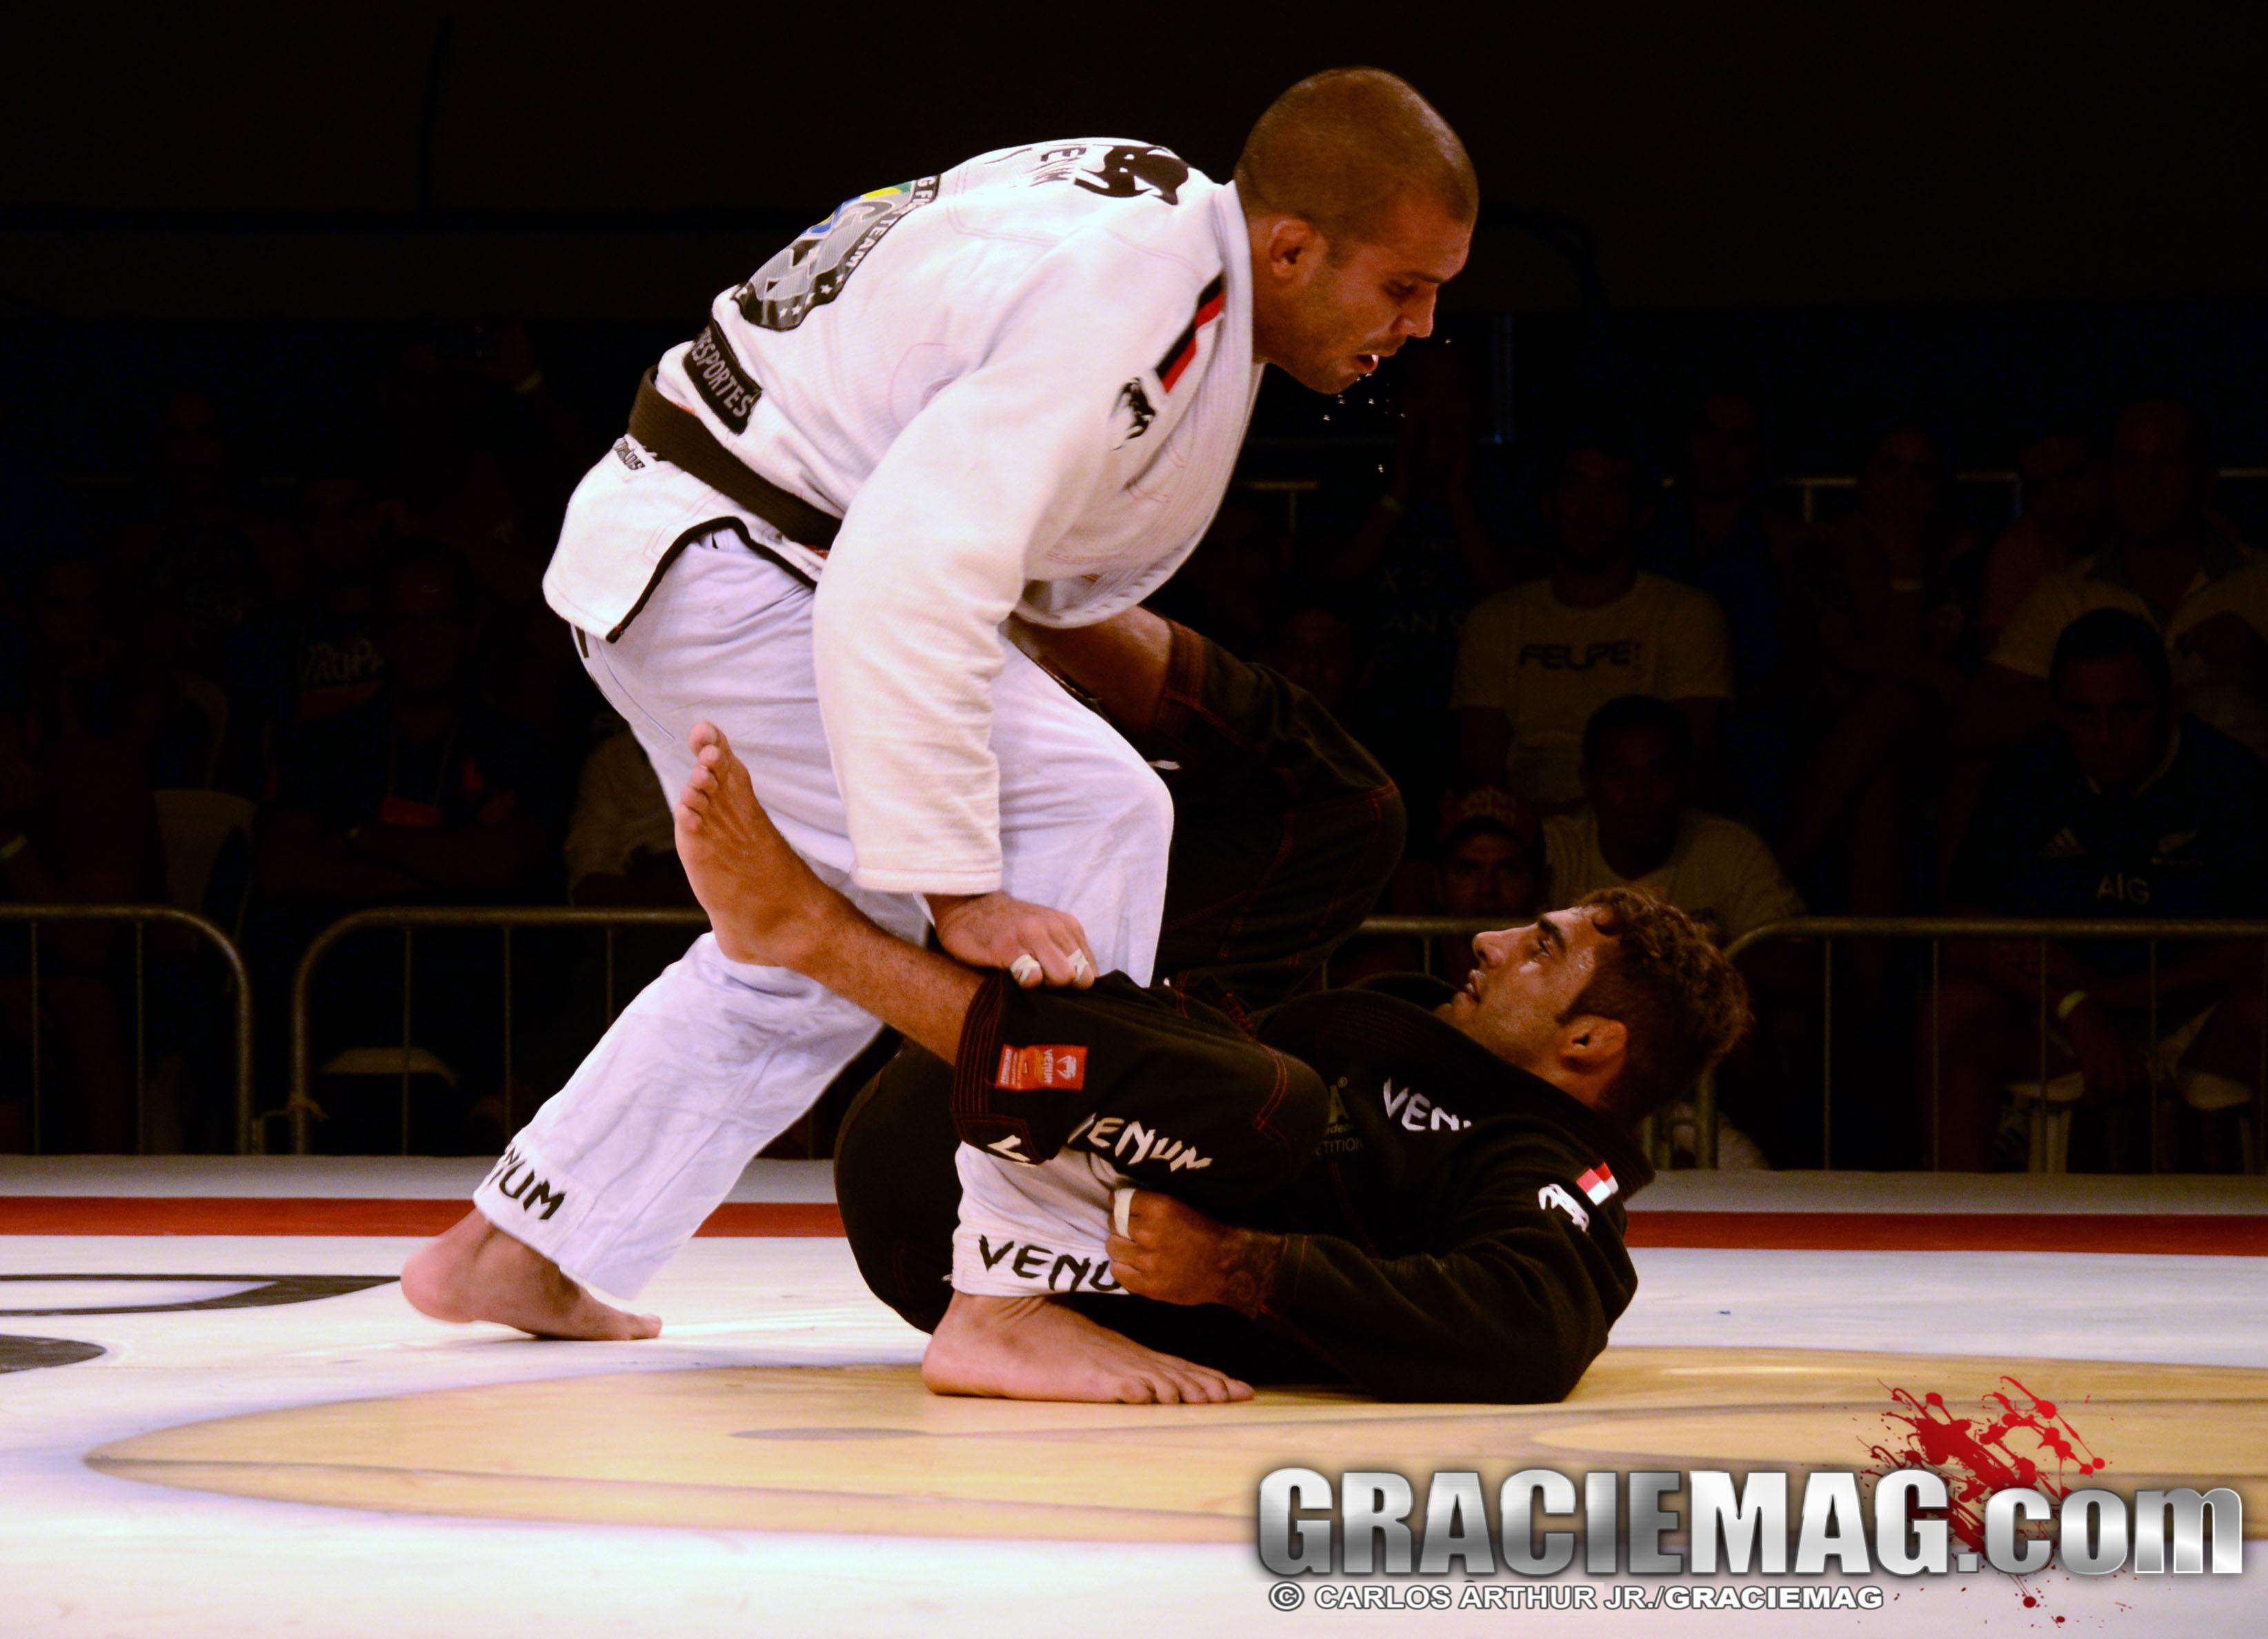 Rodolfo Vieira bota pressão na guarda de Leandro Lo. Foto: Carlos Arthur Jr.